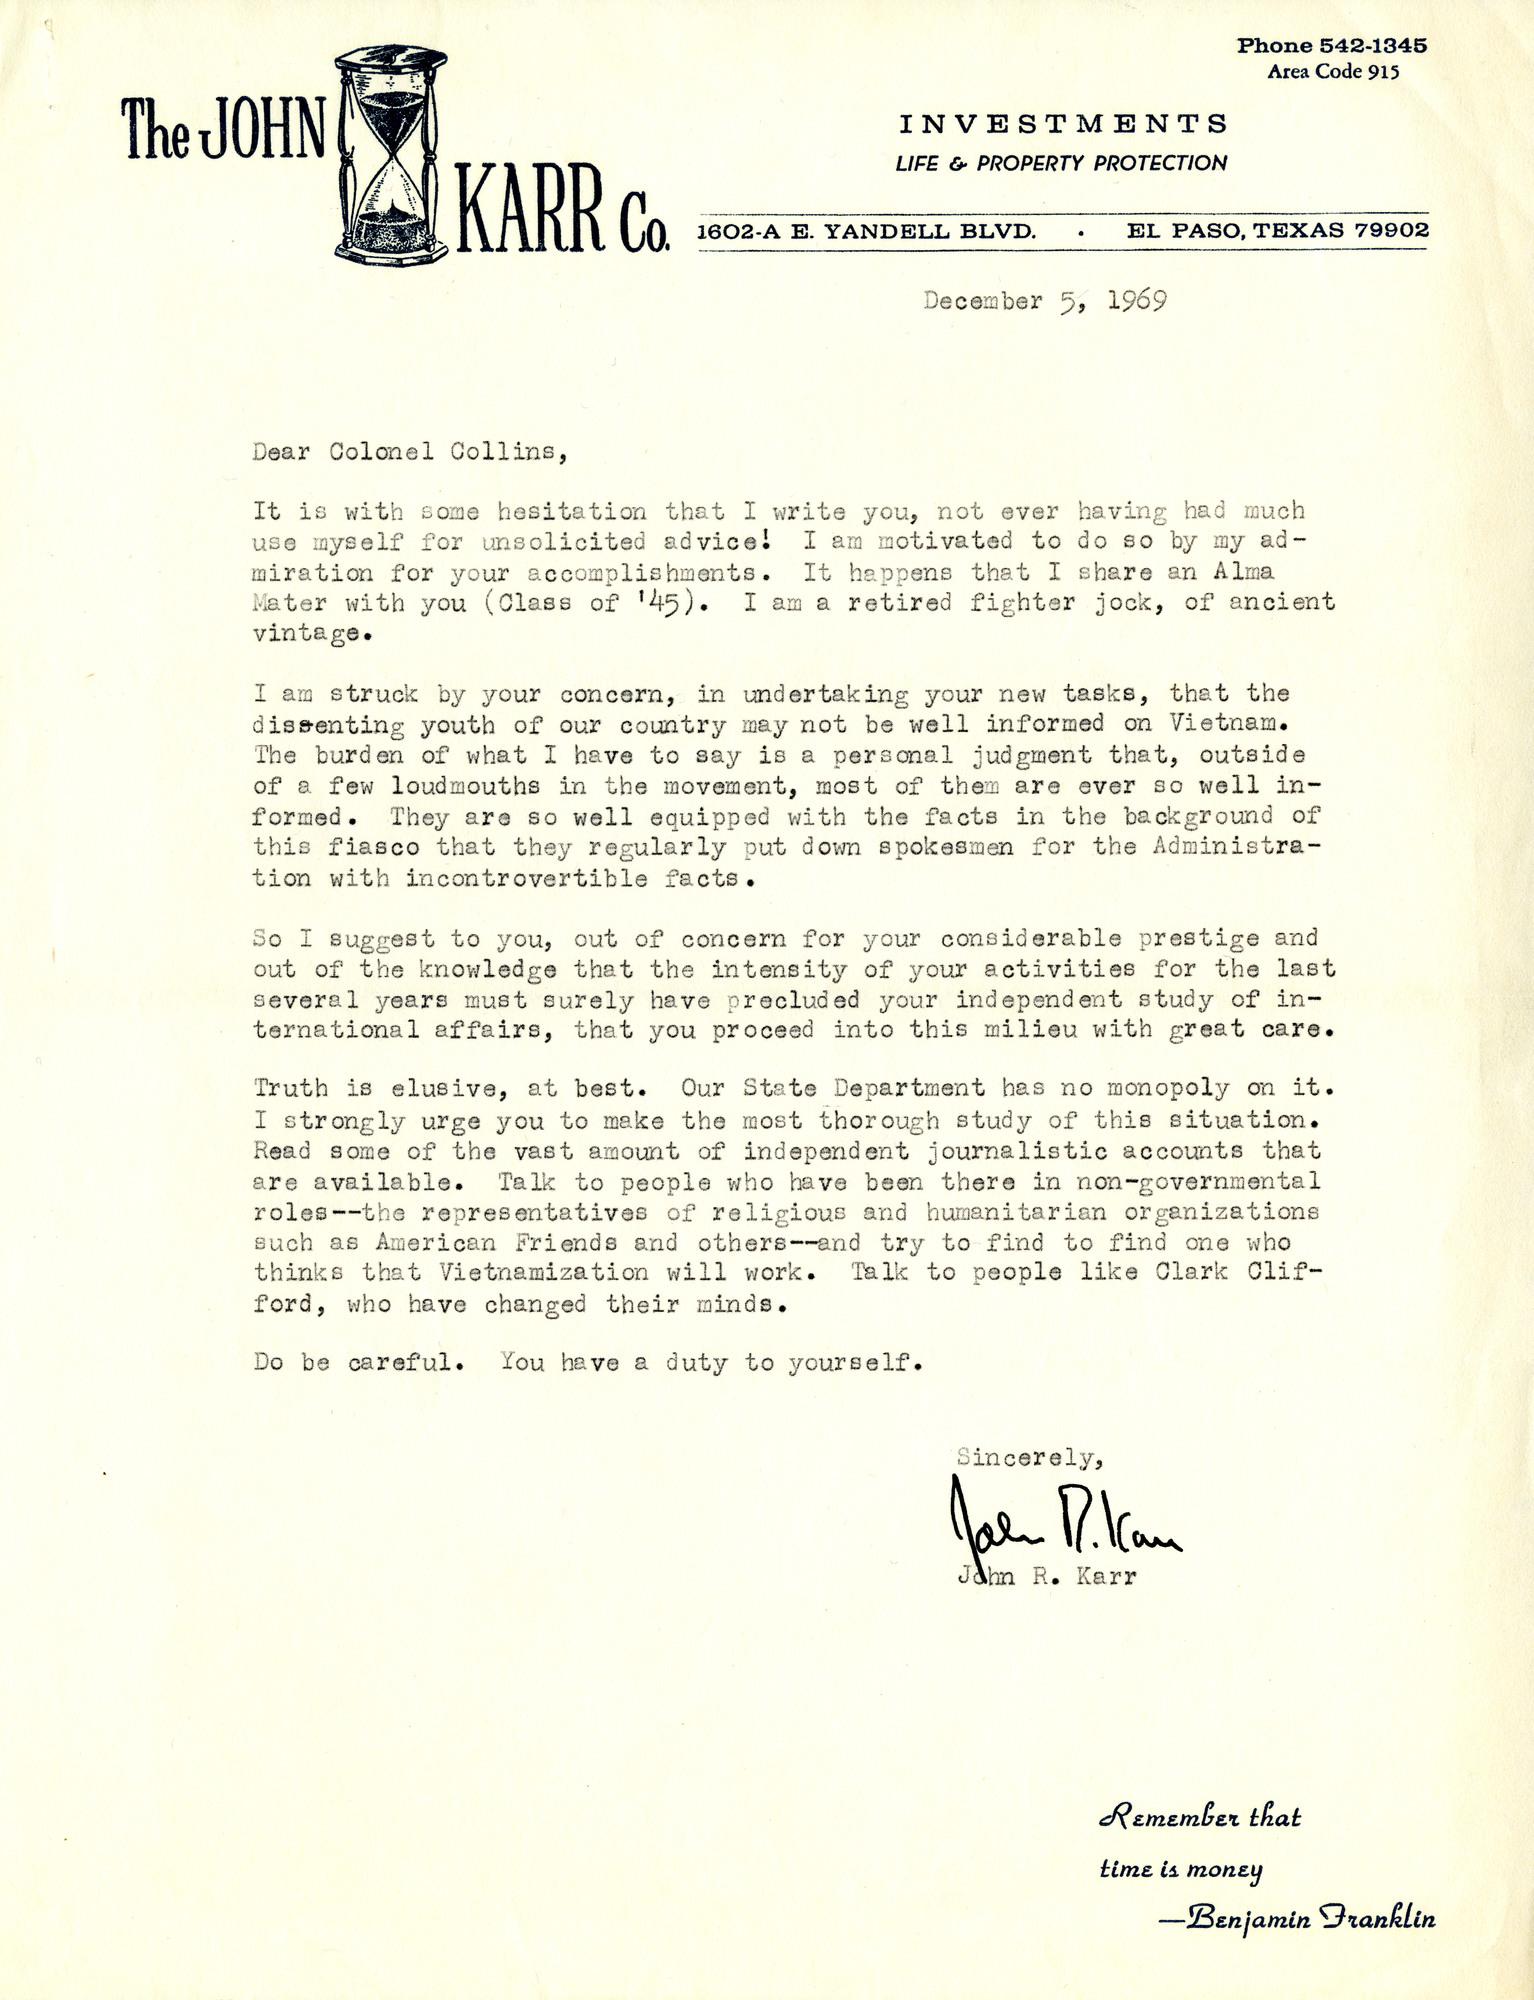 http://spec.lib.vt.edu/pickup/Omeka_upload/Ms1989-029_B18_F1_MichaelCollins_Letter_1969_1205.jpg